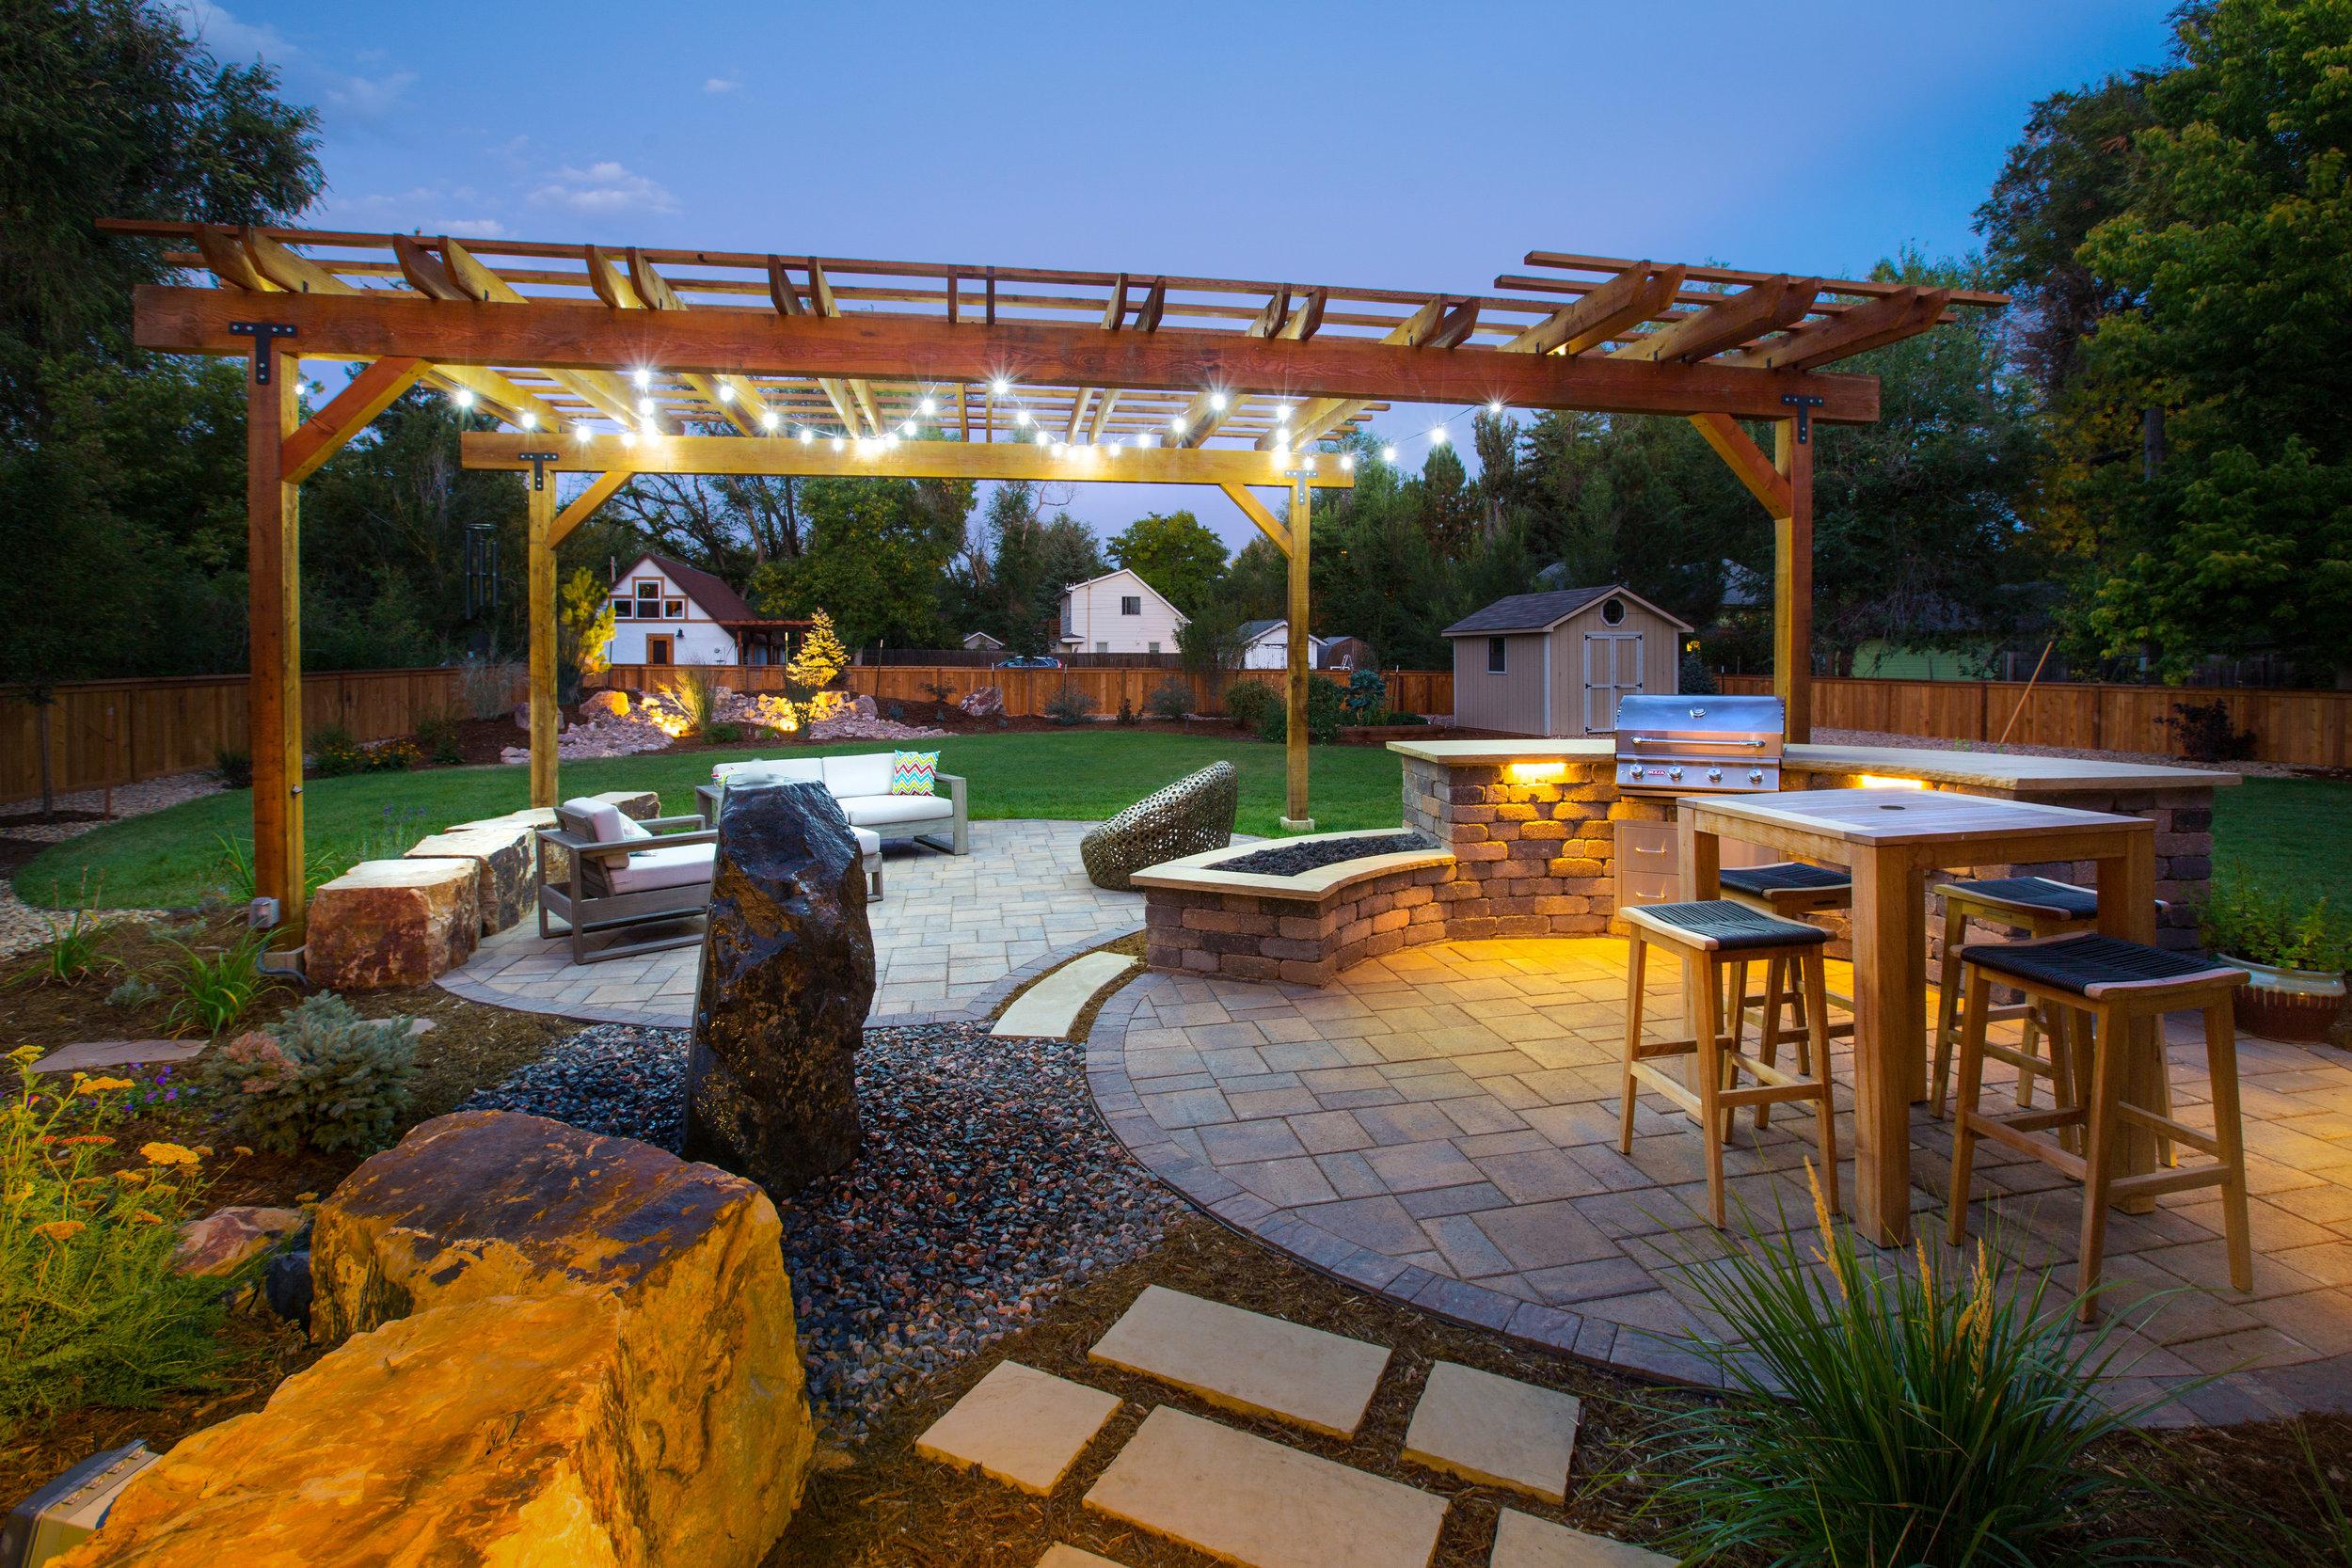 Zak George Landscaping - Residential Landscape Design & Install-1.jpg